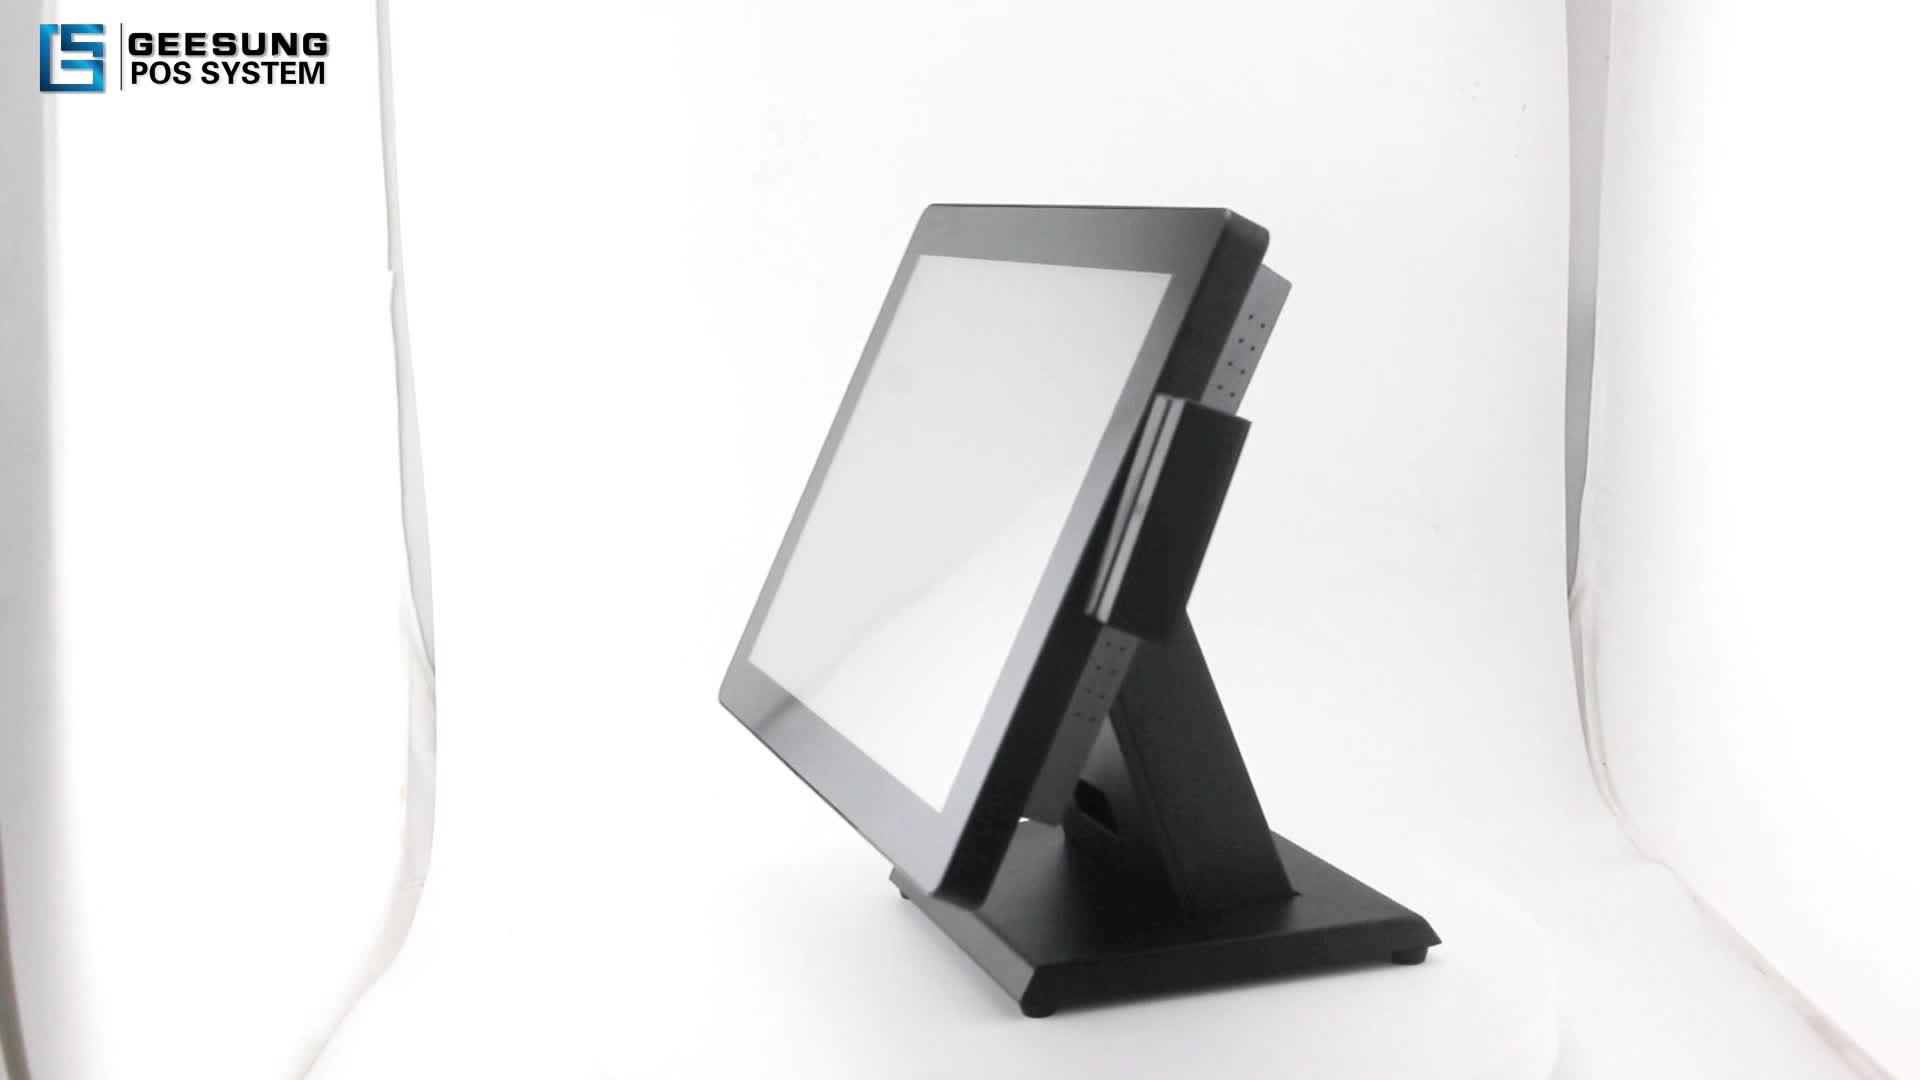 17 Inch Point Of Sale Pos Complete System include Desktop Computer/Printer/Cash drawer/VFD display